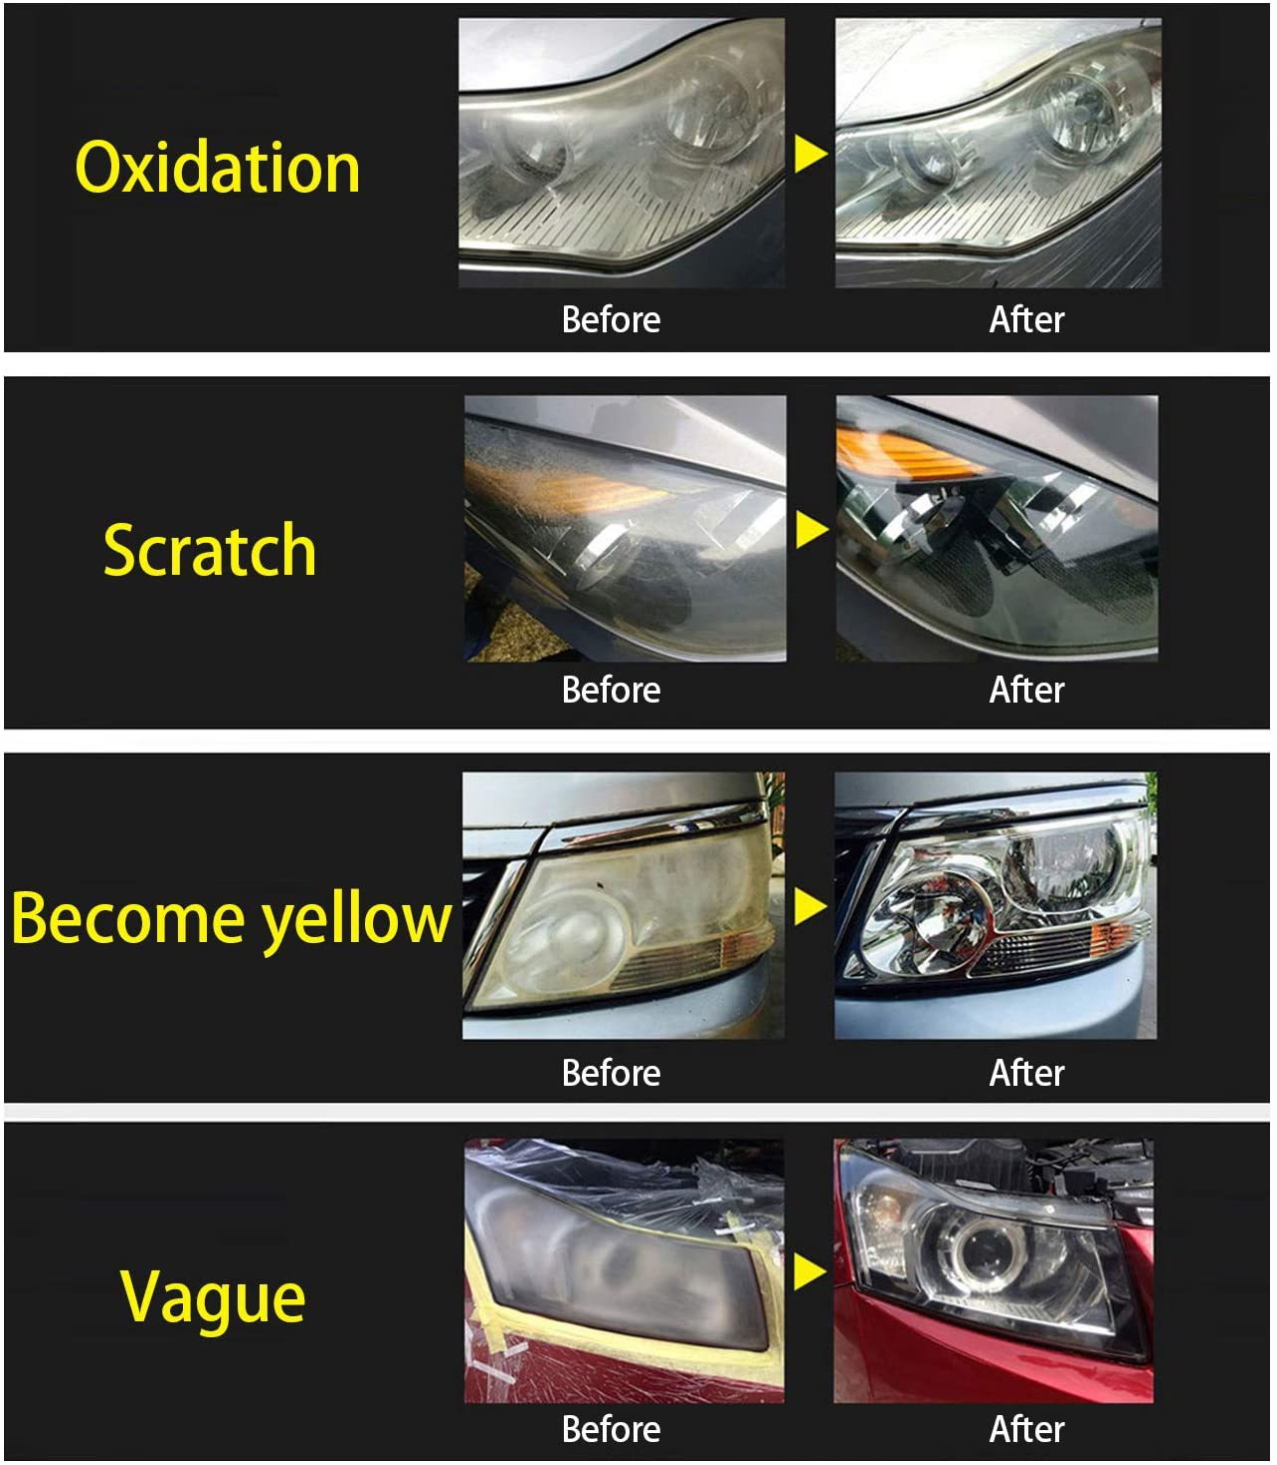 KKmoon Automobile Headlight Restoration Kits Car Glass Scratch Repair Headlight Renovation Set Headlight Lens Polish Repair Tool